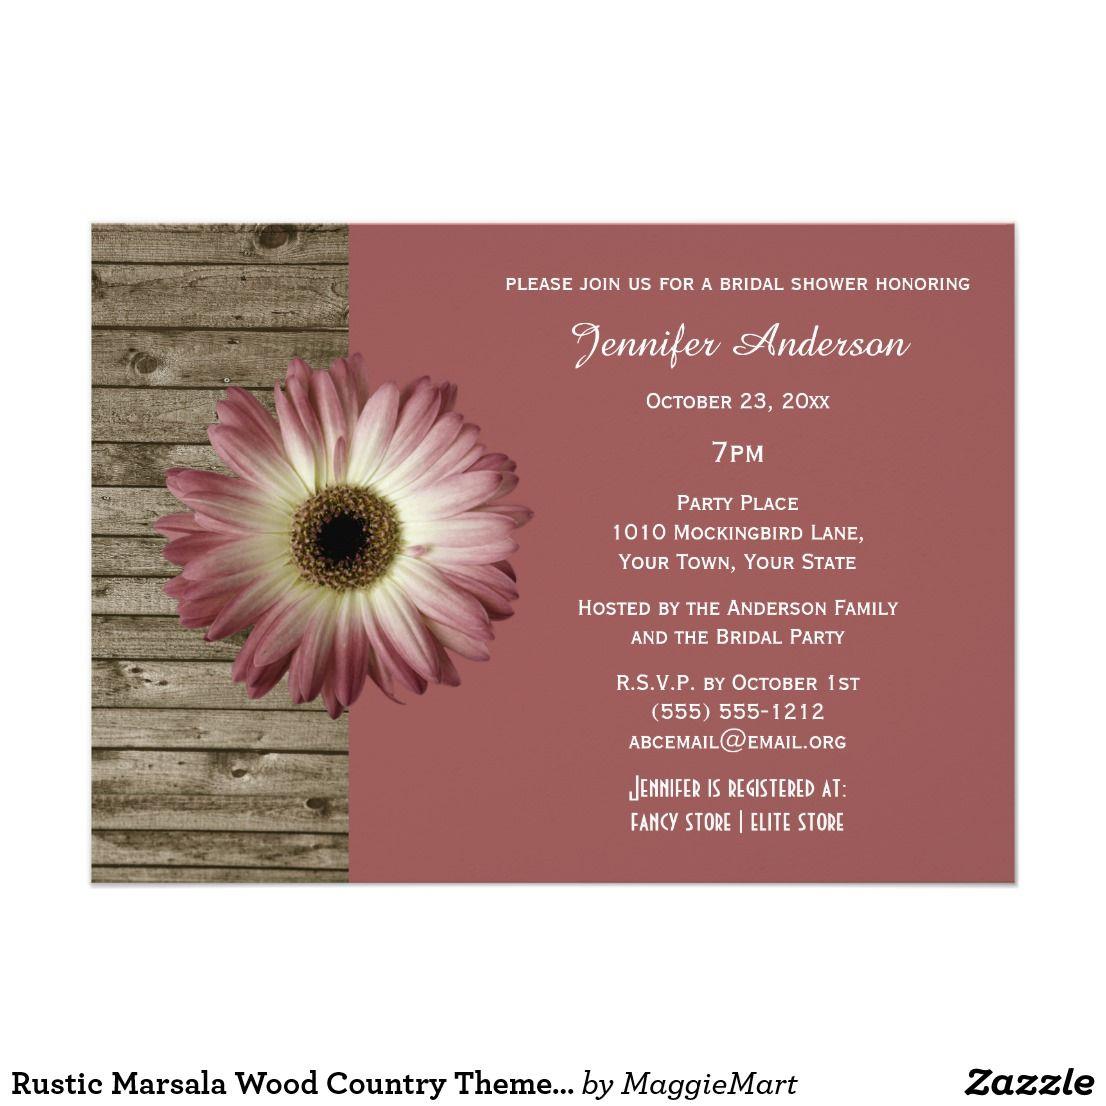 Rustic Marsala Wood Country Theme Bridal Shower Card   Marsala wine ...